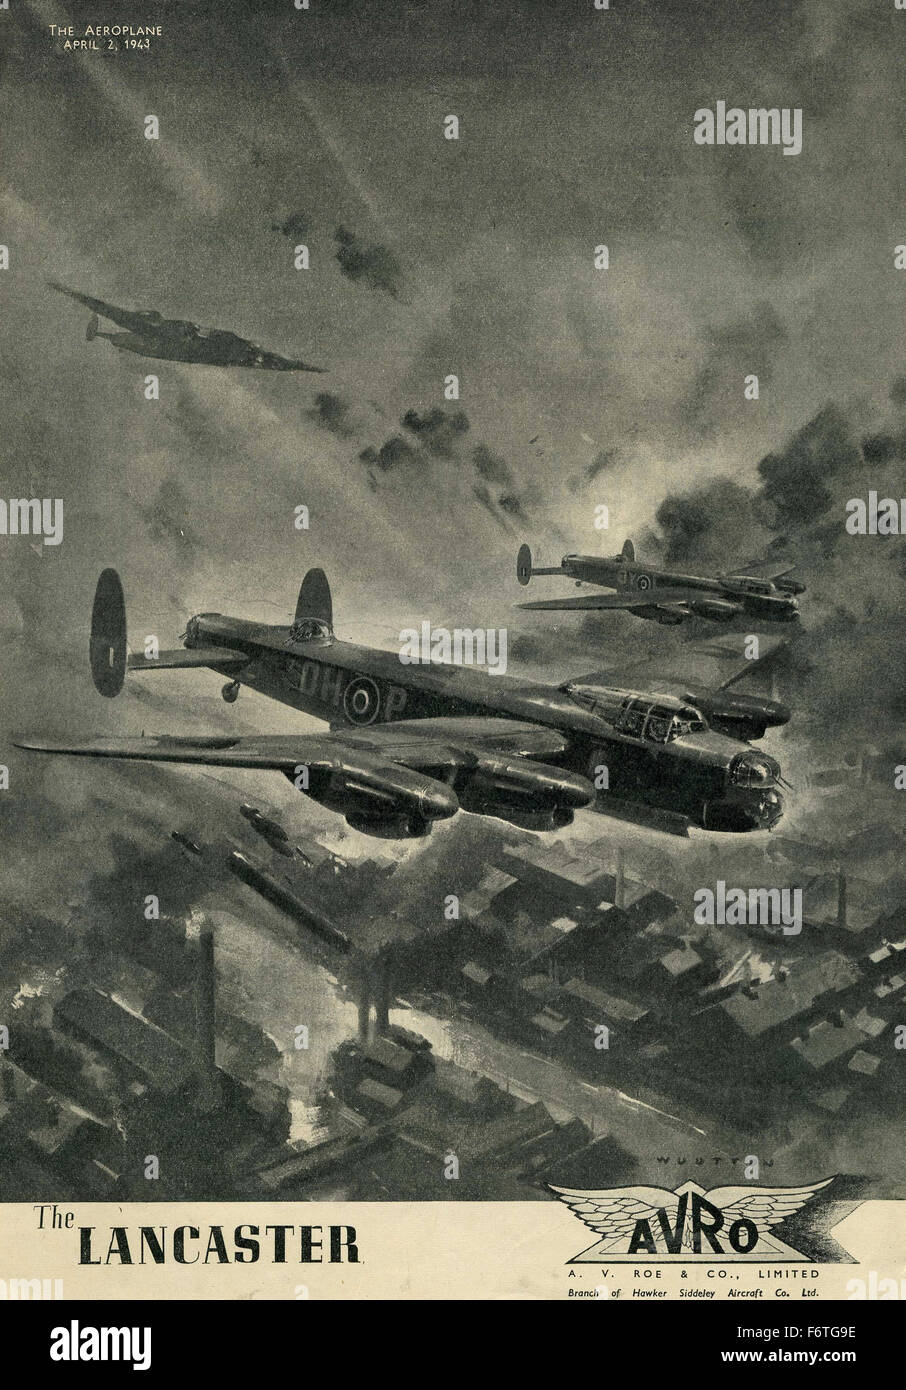 Lancaster Avro bomber WW2 1943 advert - Stock Image